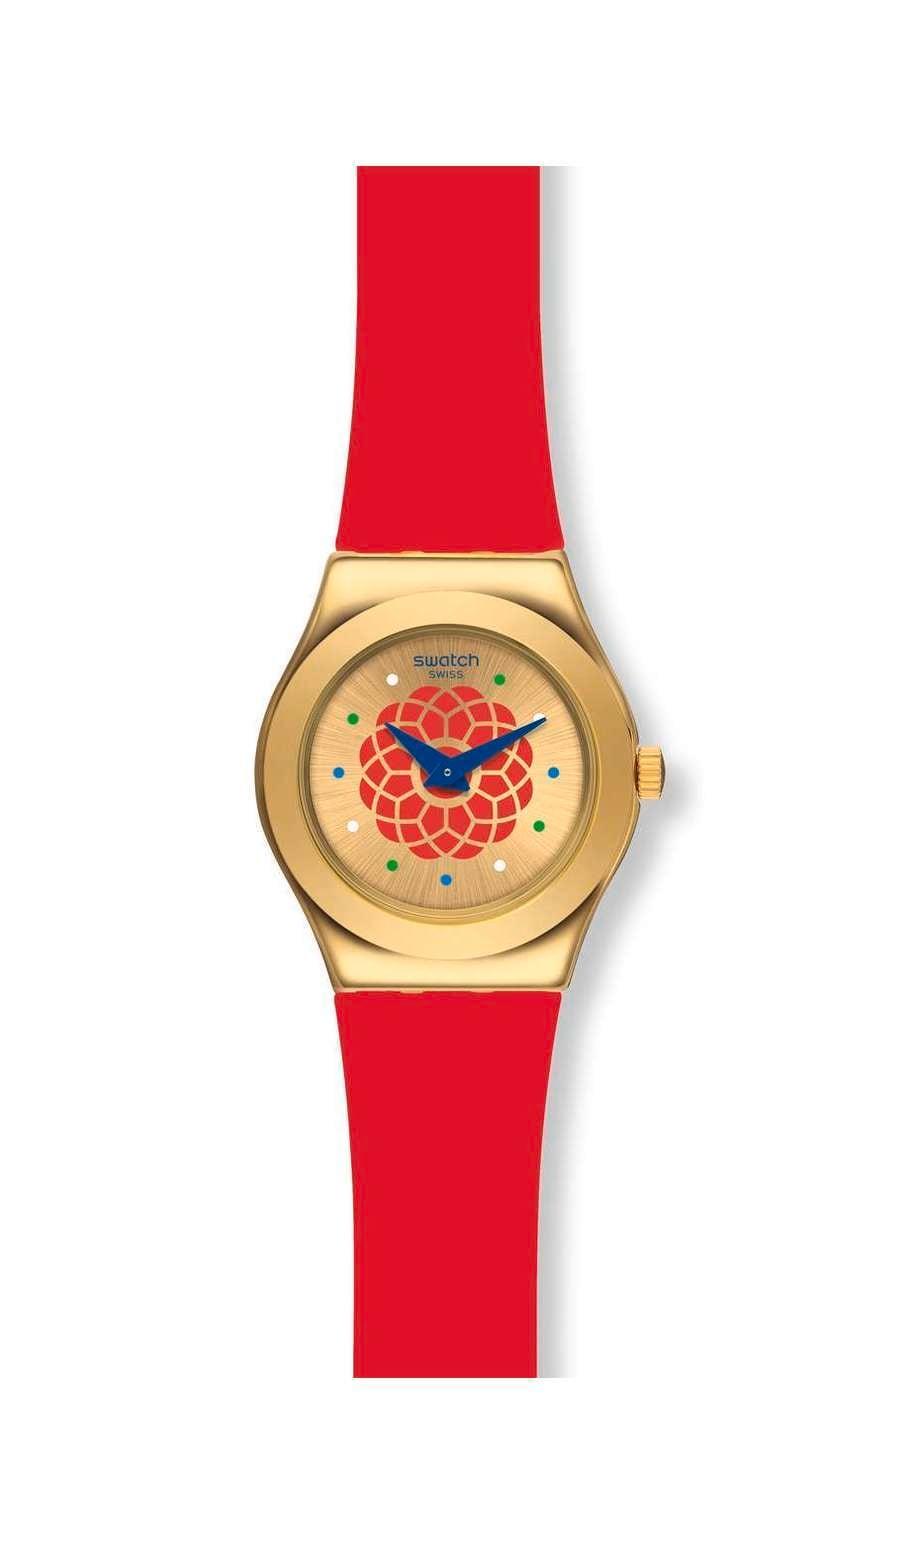 Swatch - PARFUM D'ORIENT - 1